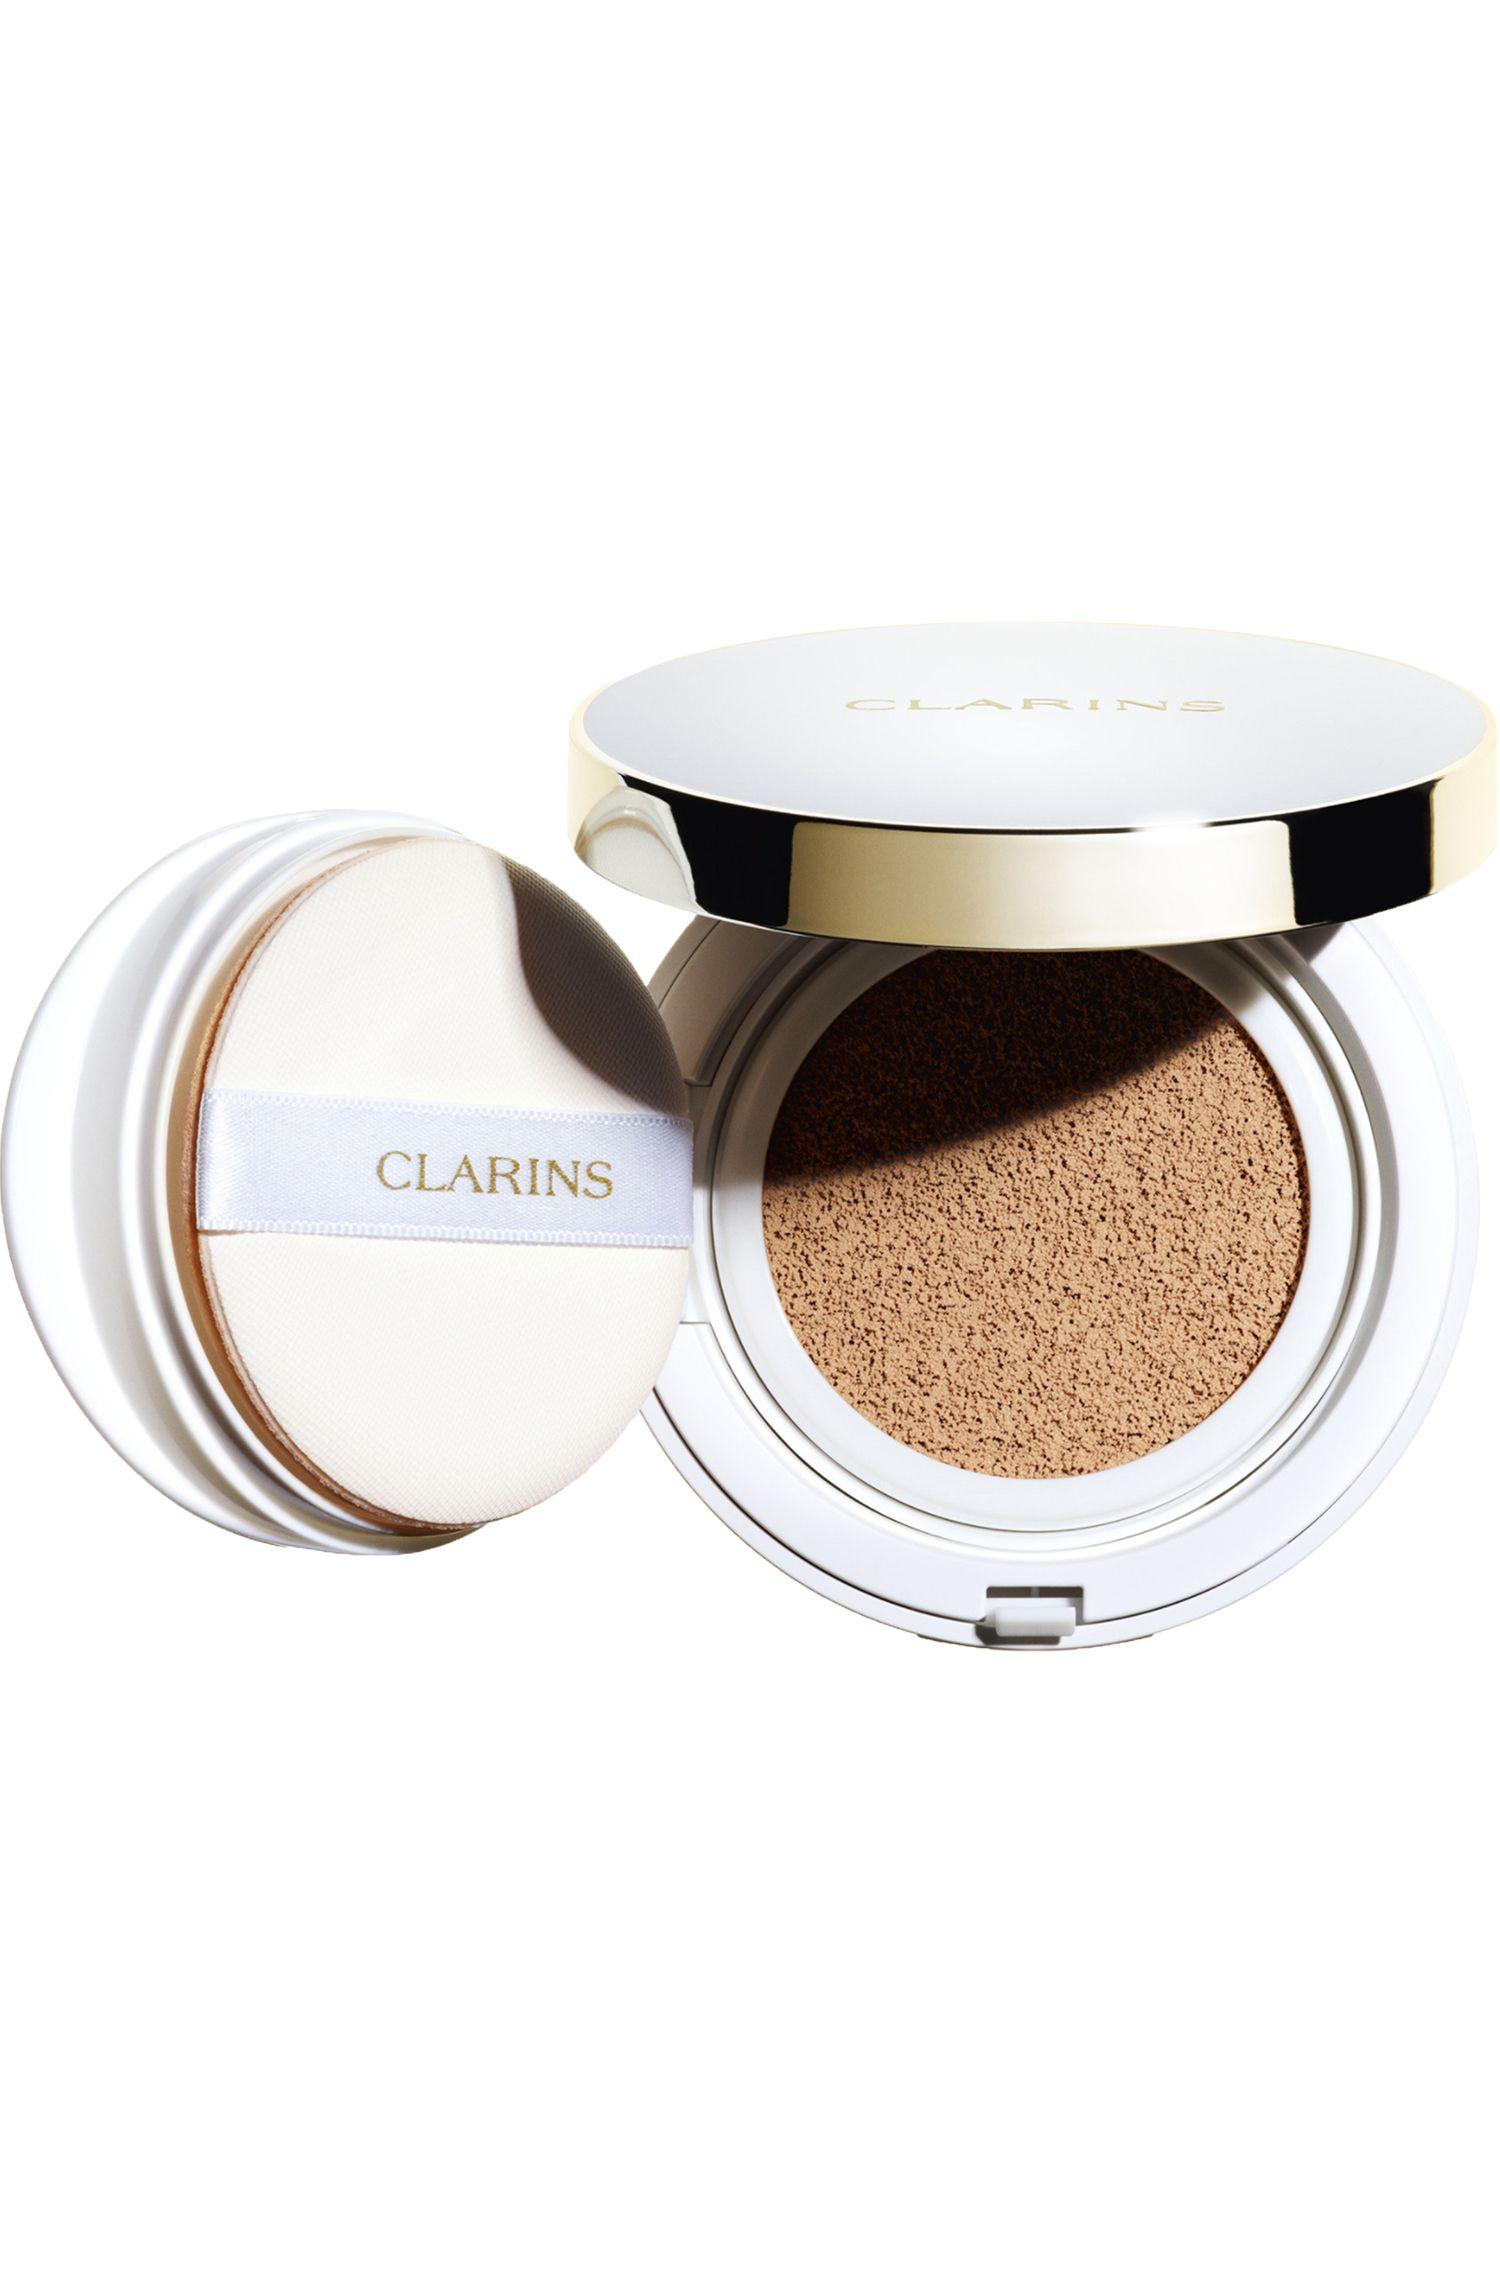 Blissim : Clarins - Fond de teint Cushion longue tenue SPF50 - Fond de teint Cushion longue tenue SPF50